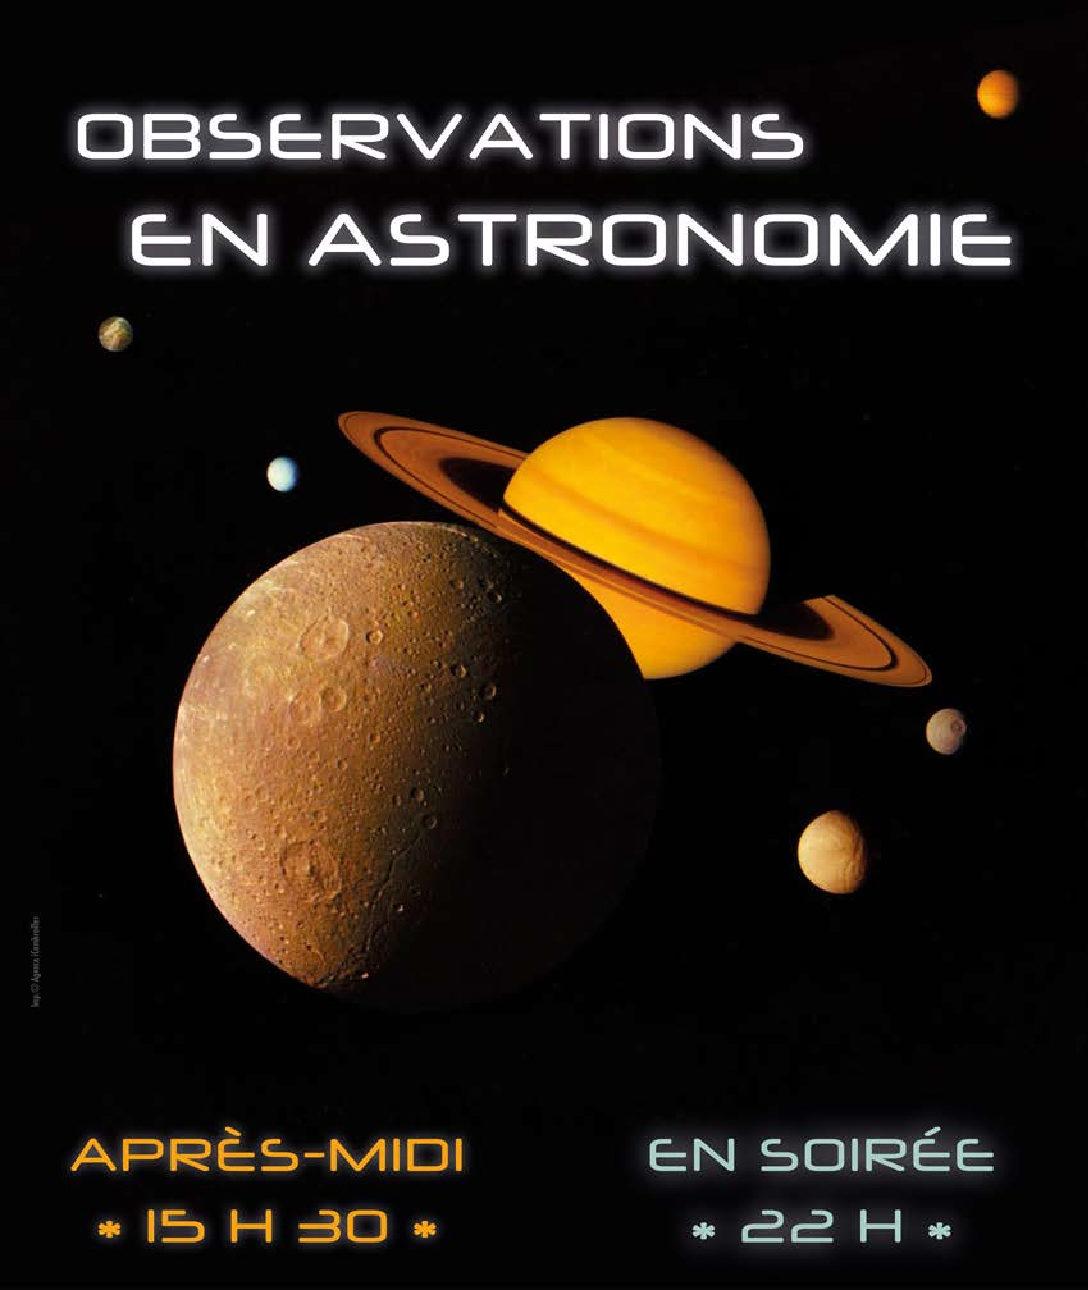 Observation en astronomie